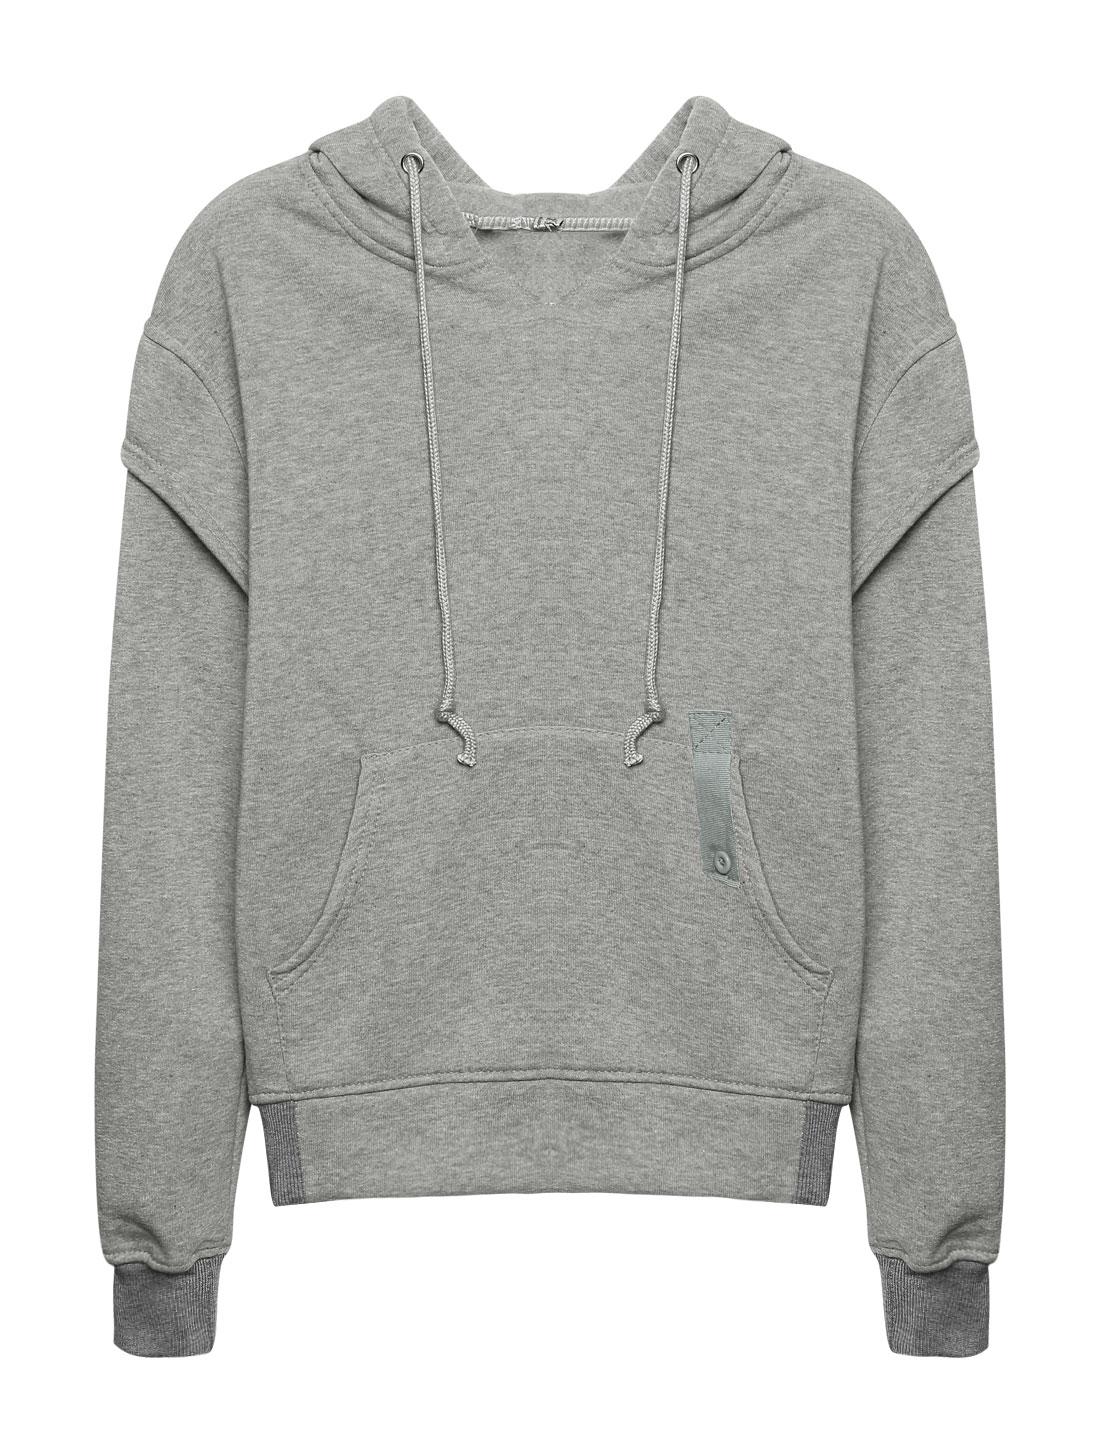 Women Kangaroo Pocket Embroidered Letters Drawstring Hoodie Gray XS